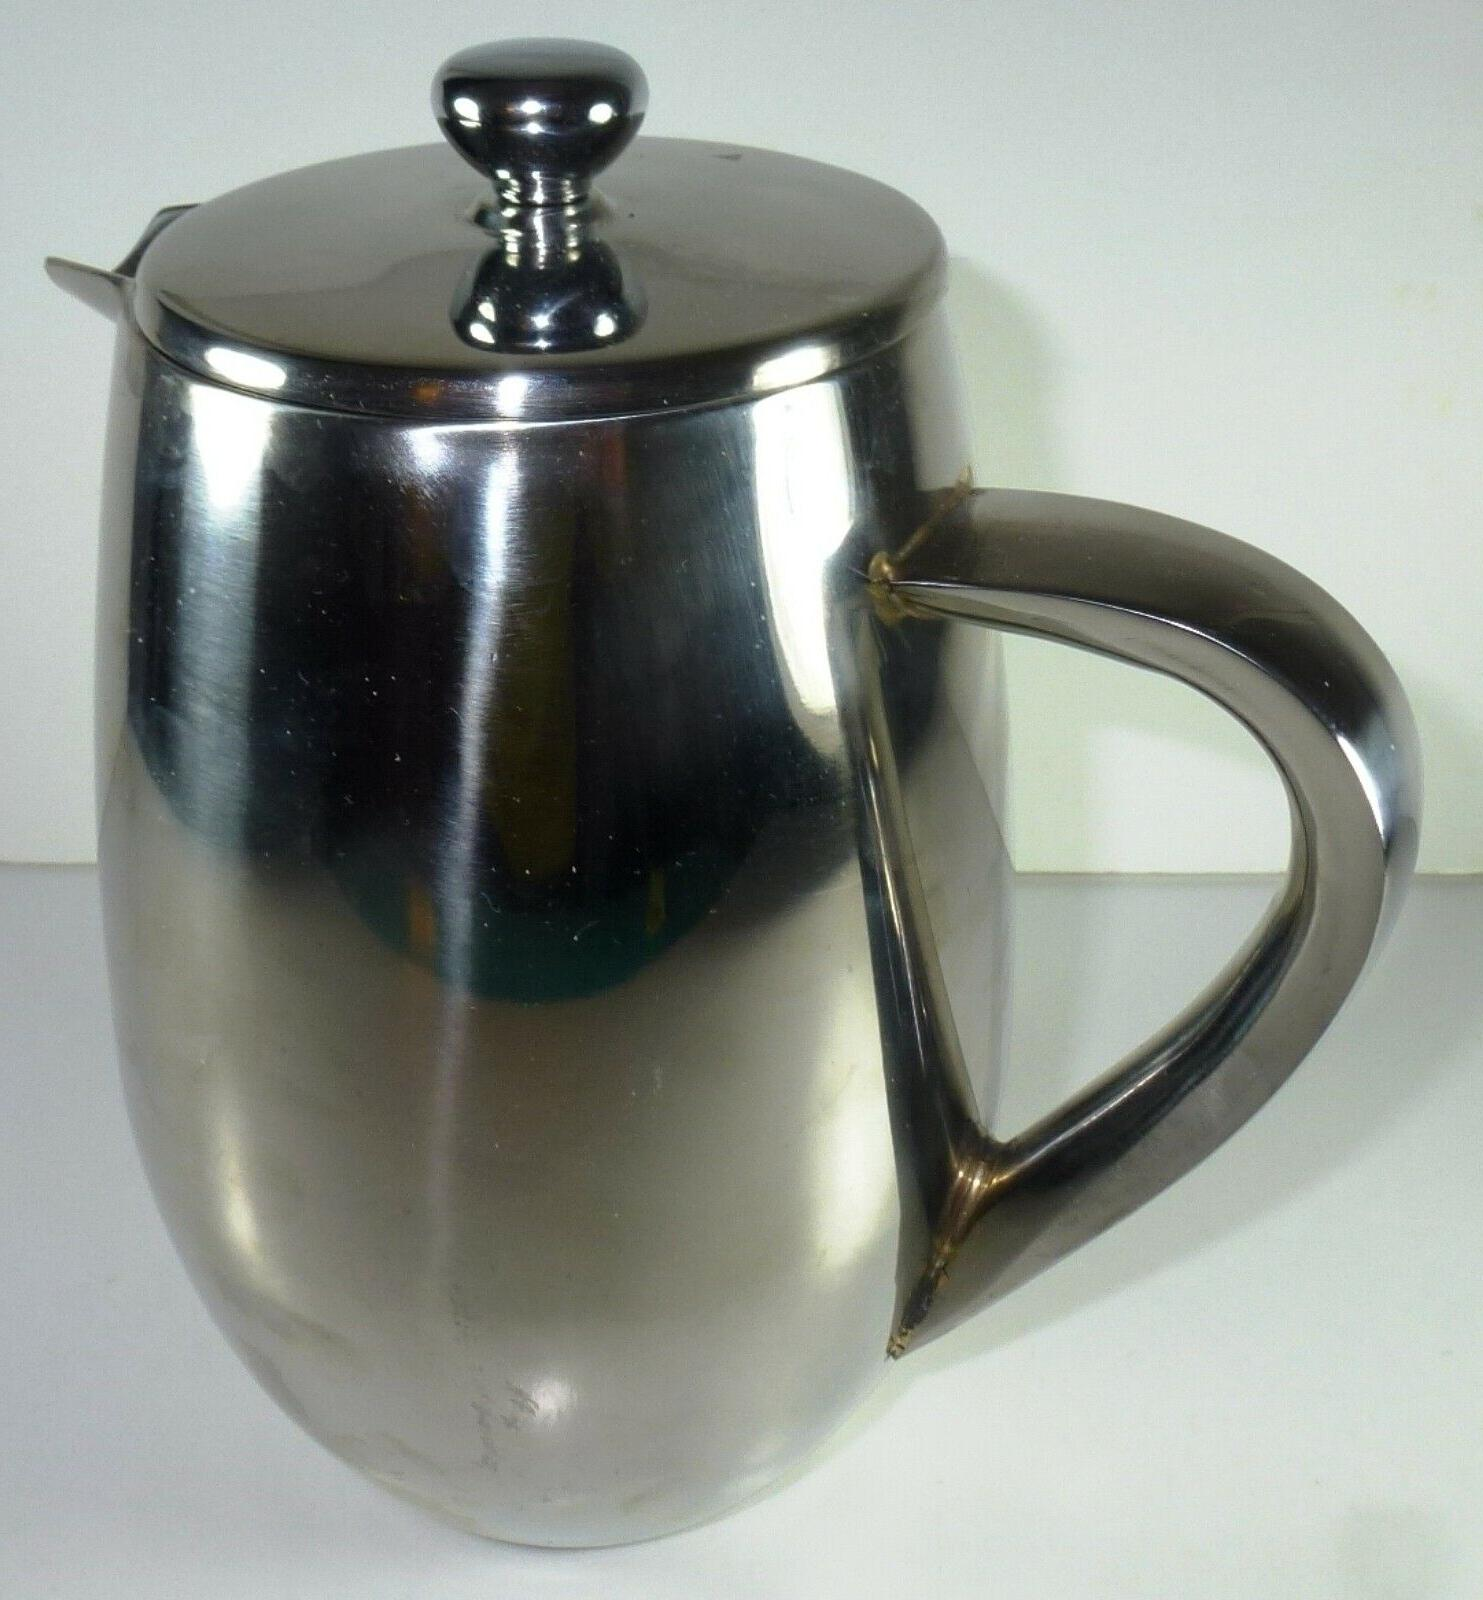 *NWOB* Linkyo Press Stainless Coffee Maker Oz.